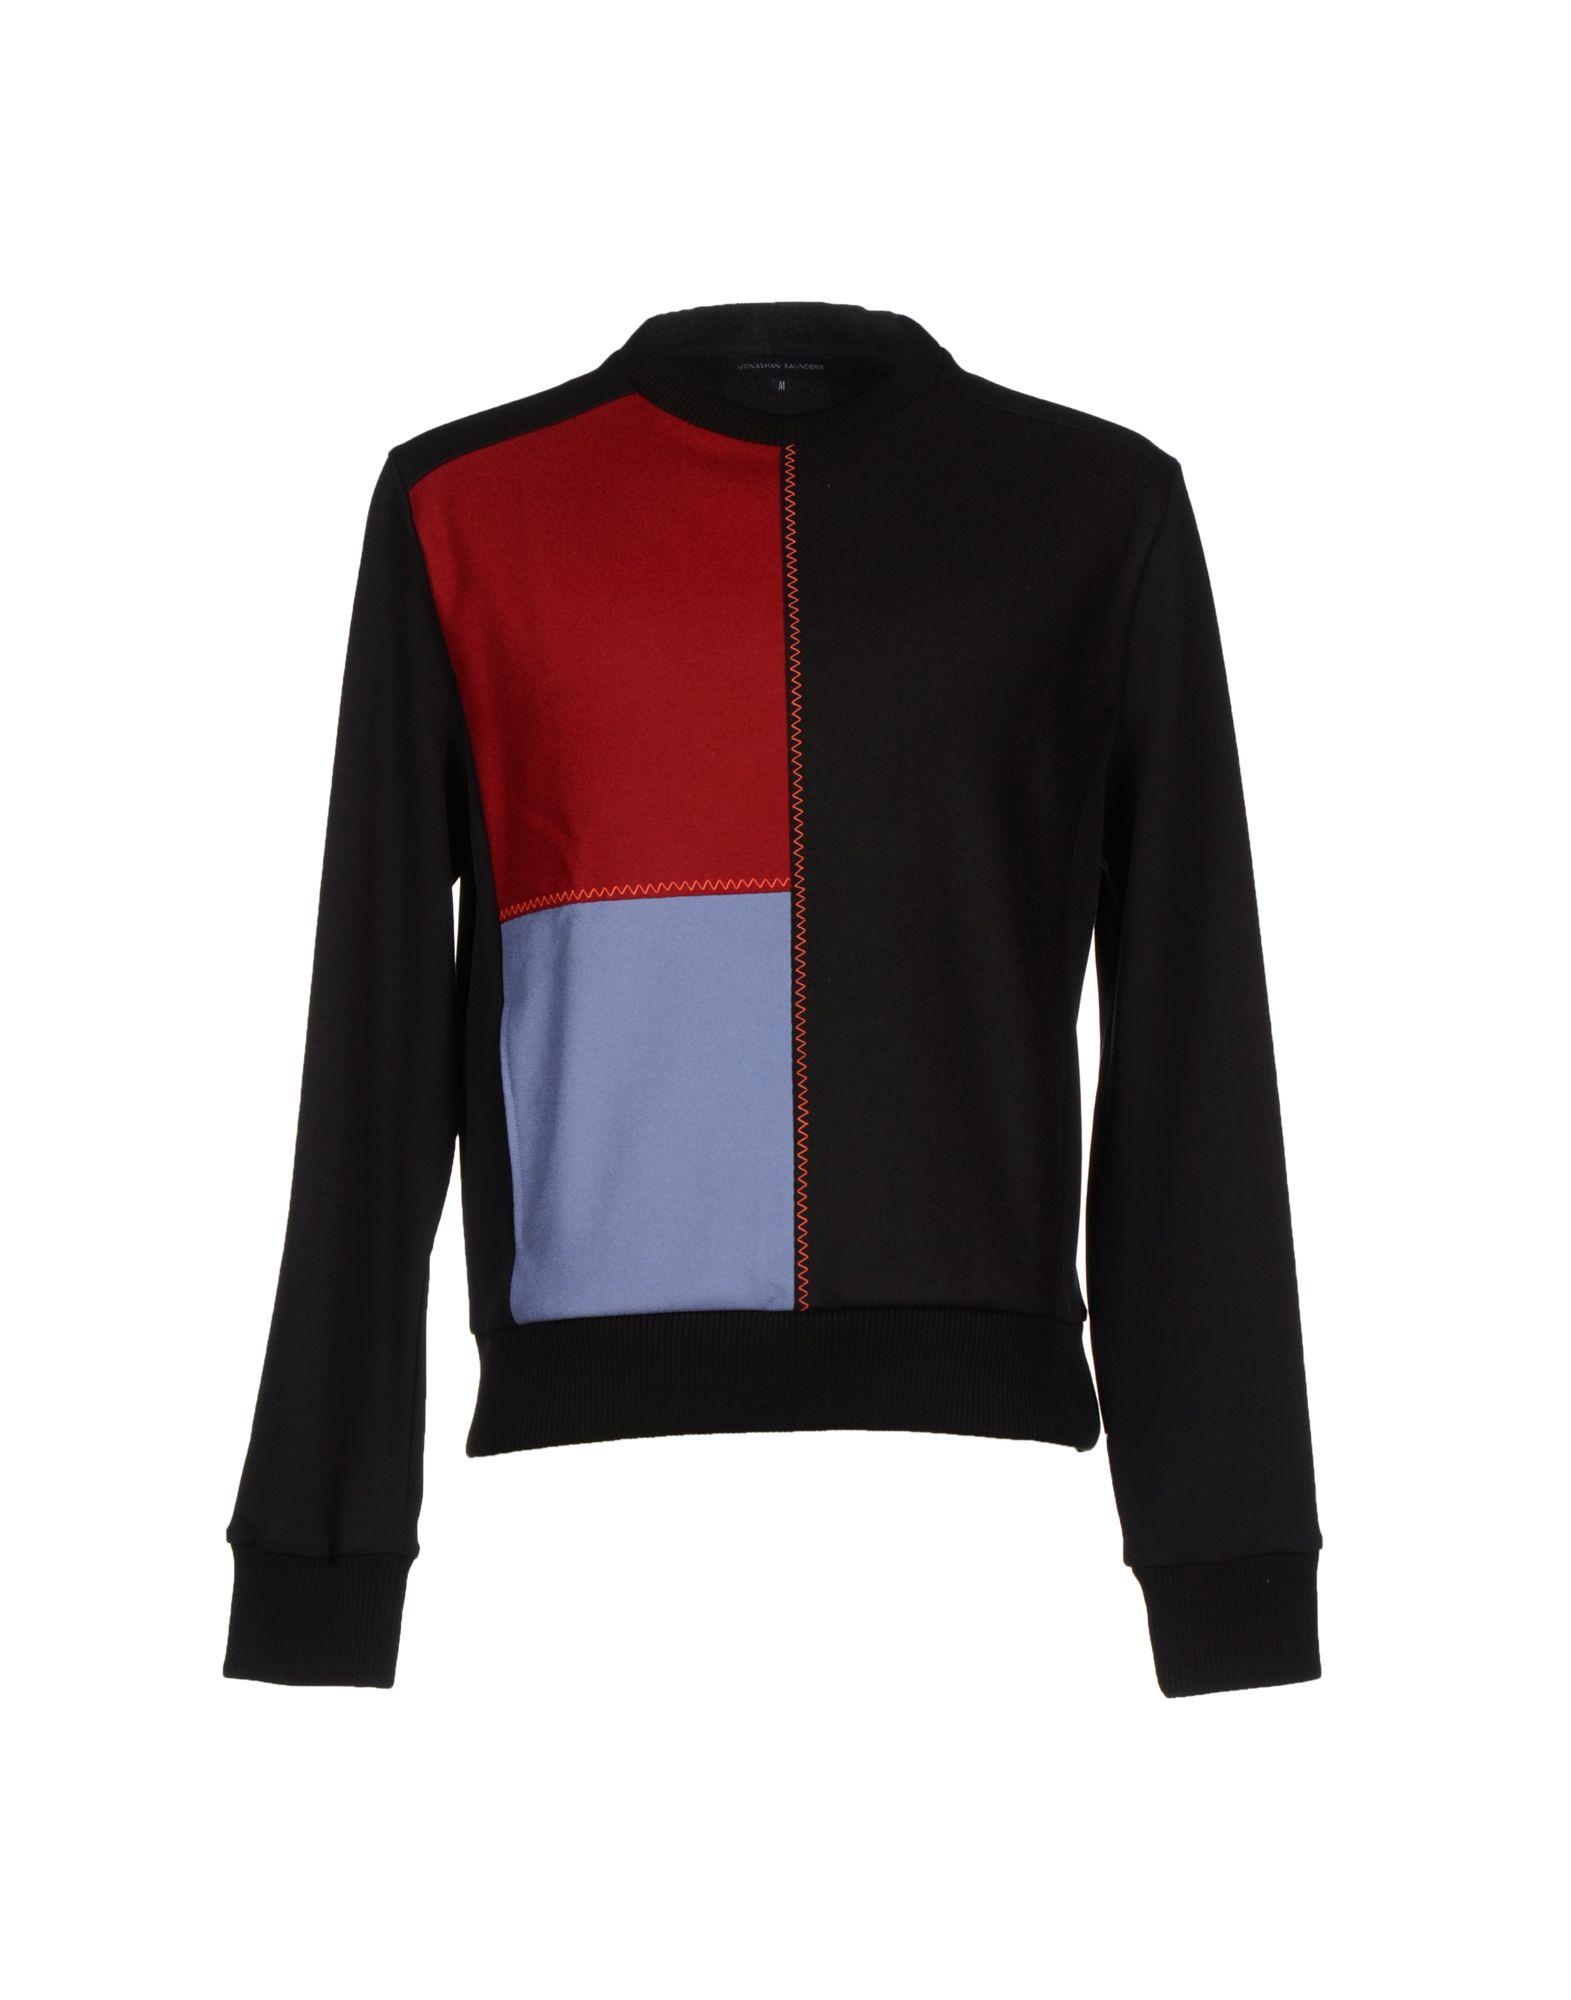 JONATHAN SAUNDERS Sweatshirt in Black